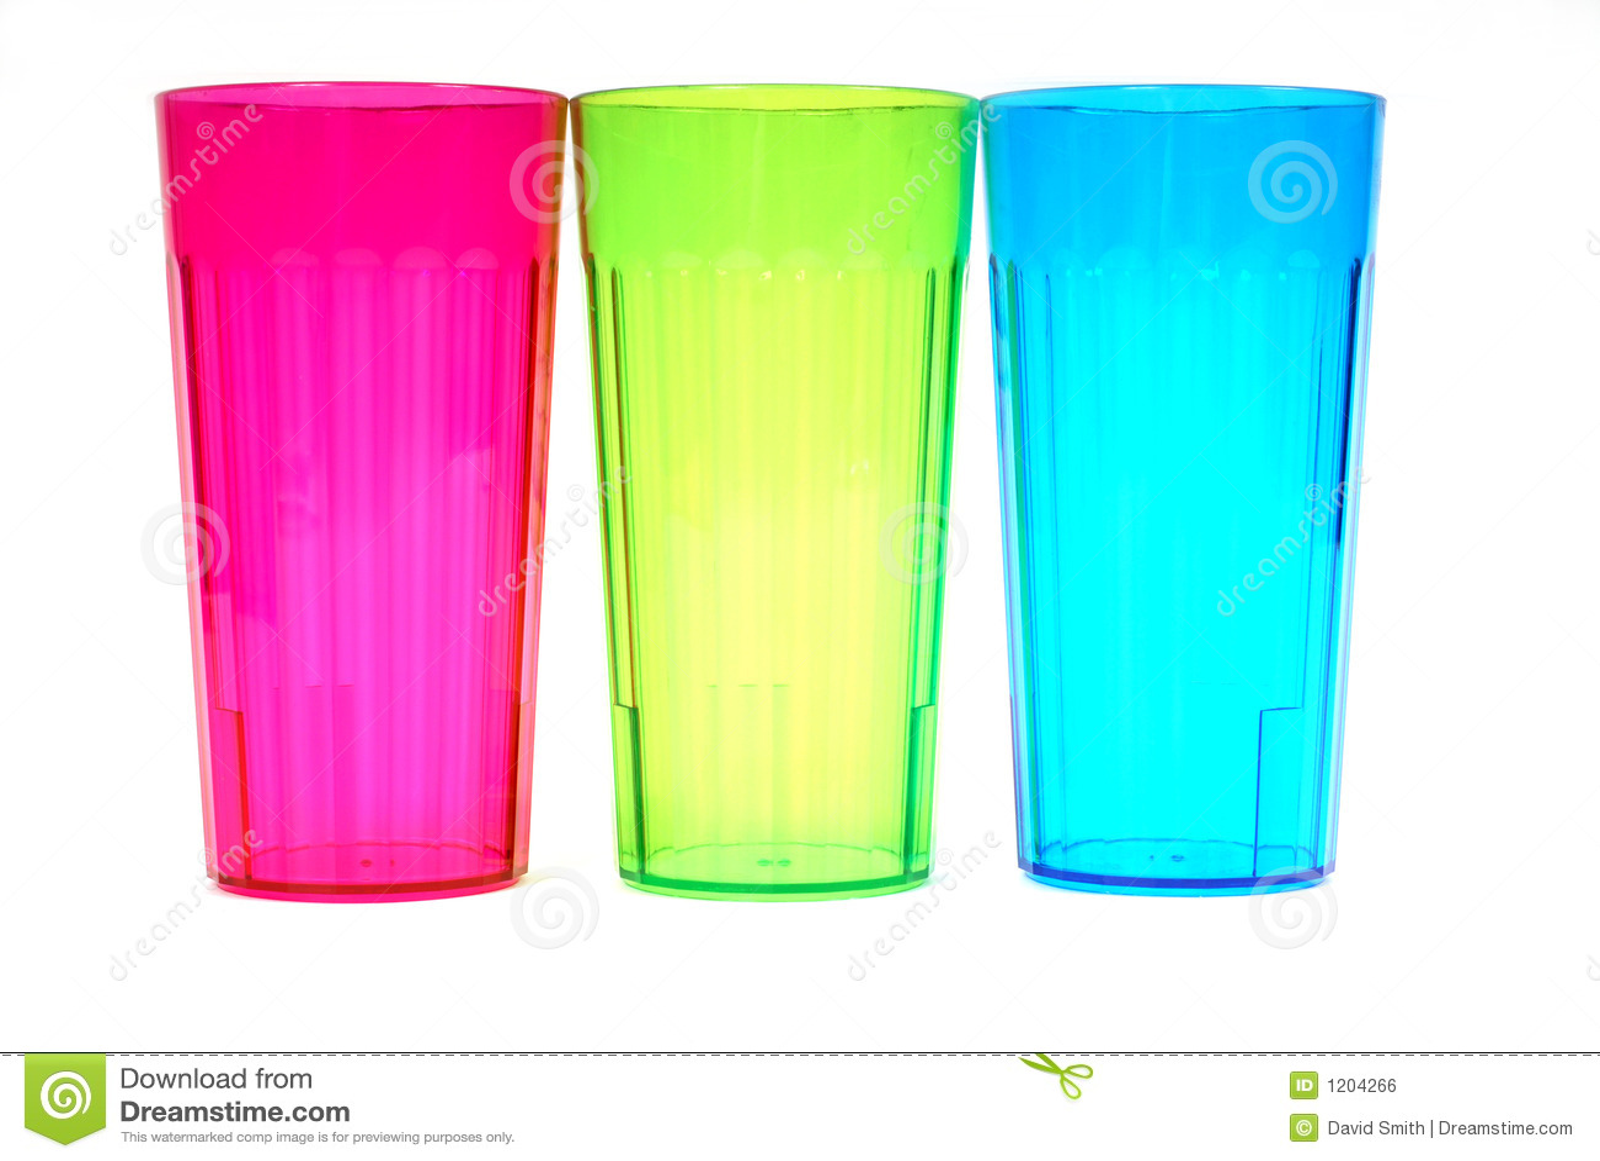 Three colorful beverage glasses